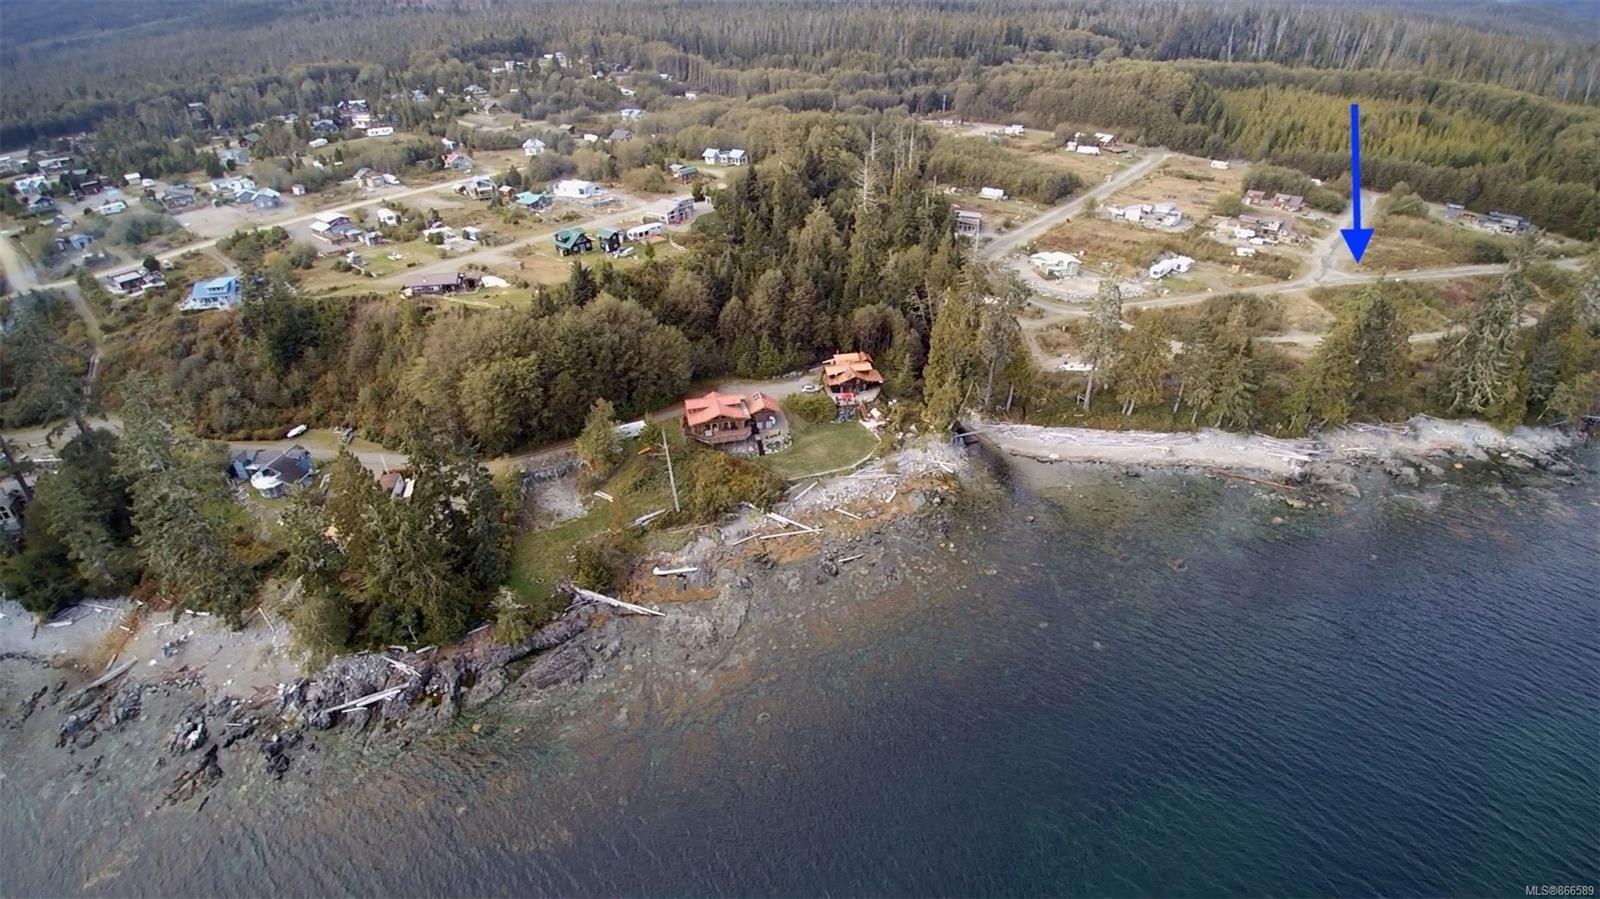 Main Photo: 1162 Front St in : PA Salmon Beach Land for sale (Port Alberni)  : MLS®# 866589